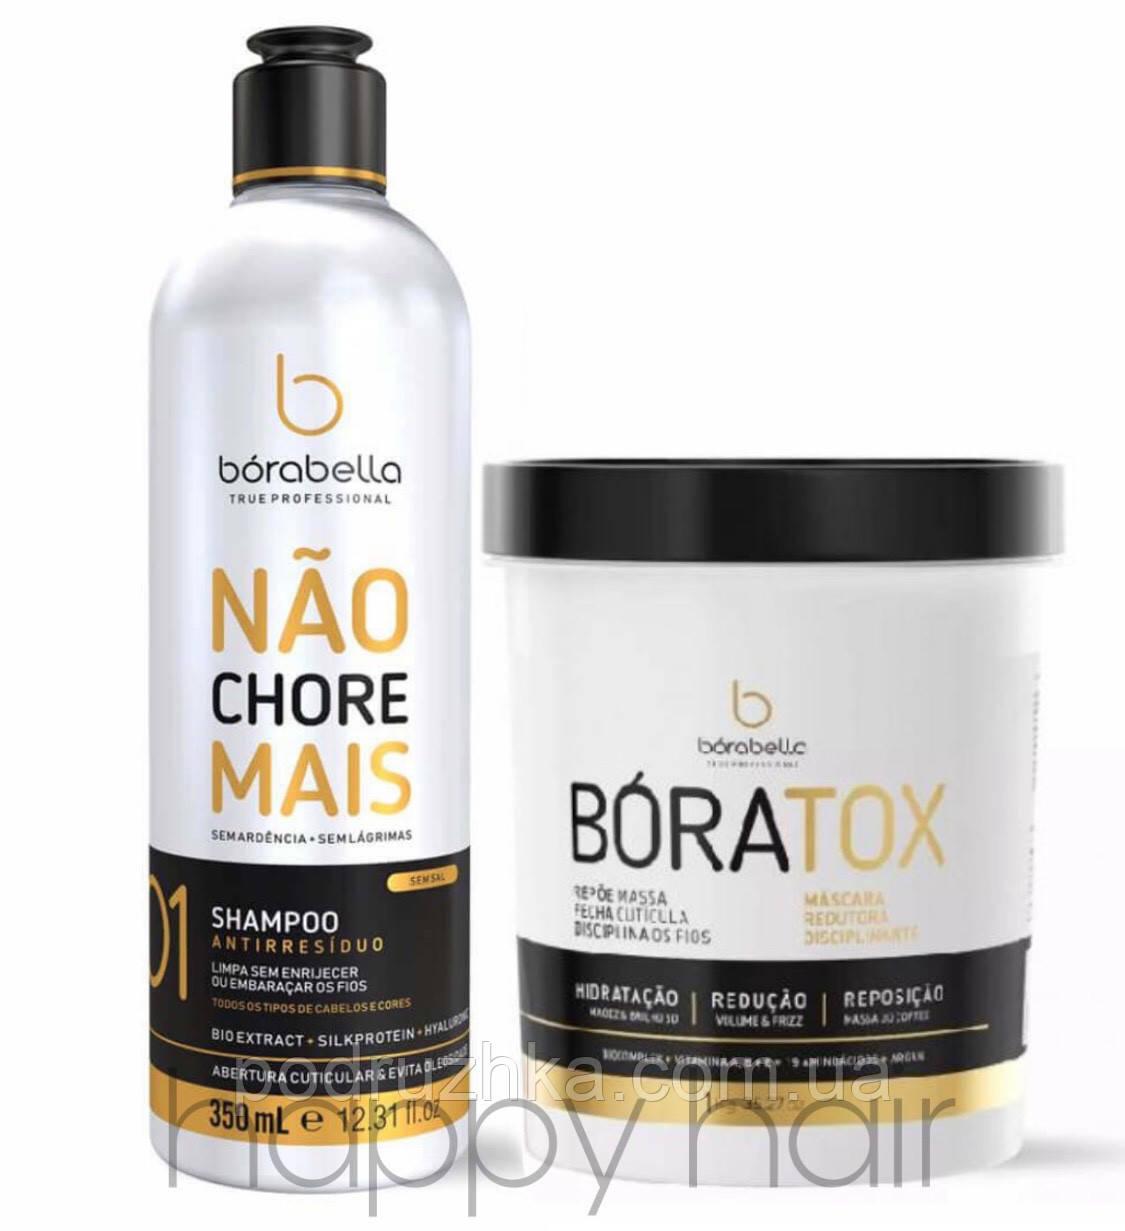 Borabella Organic Boratox Набор ботокс для волос 2х500 г